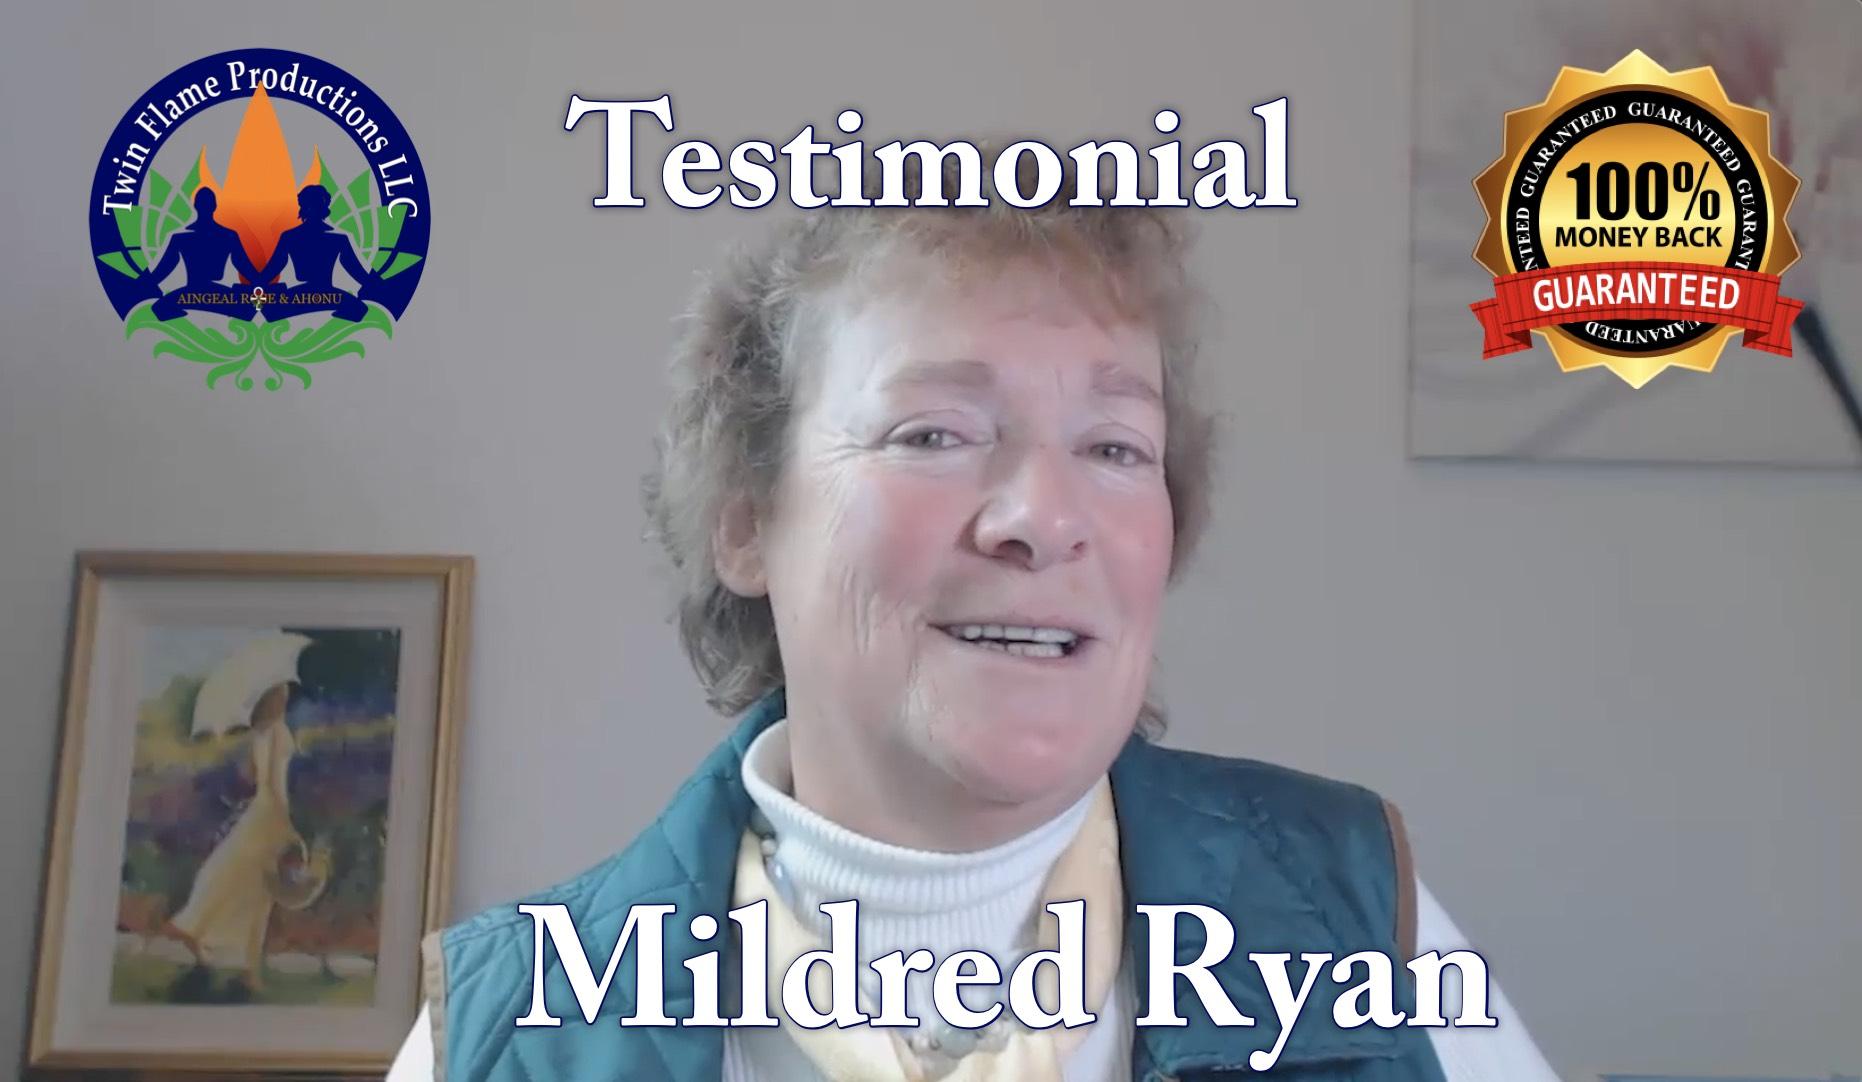 Testimonial from Mildred Ryan